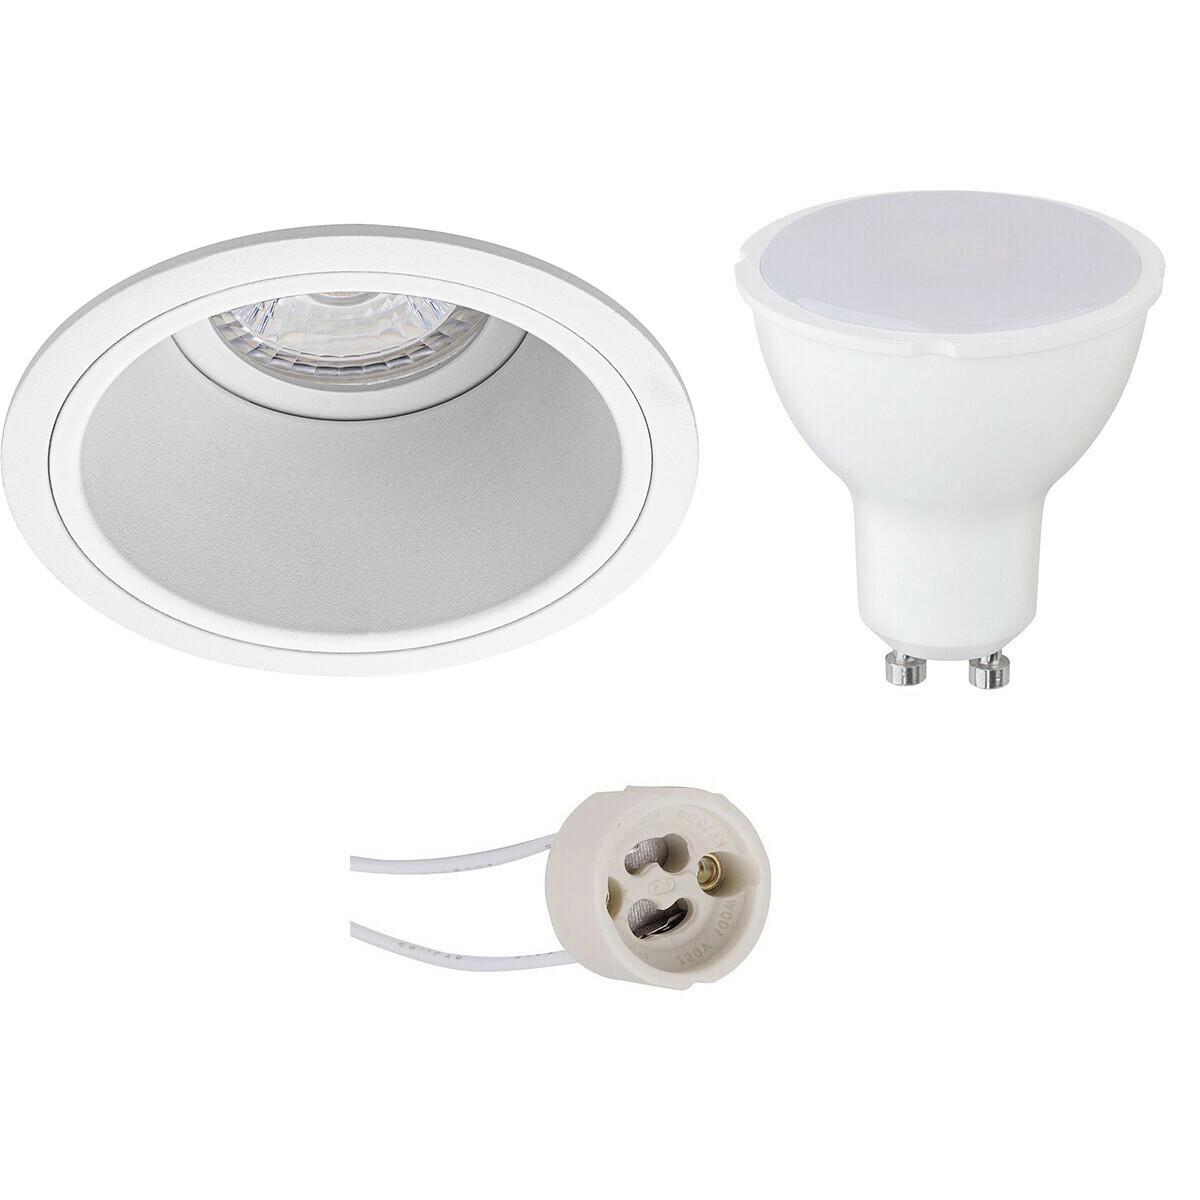 LED Spot Set - Pragmi Minko Pro - GU10 Fitting - Inbouw Rond - Mat Wit - 4W - Warm Wit 3000K - Verdi